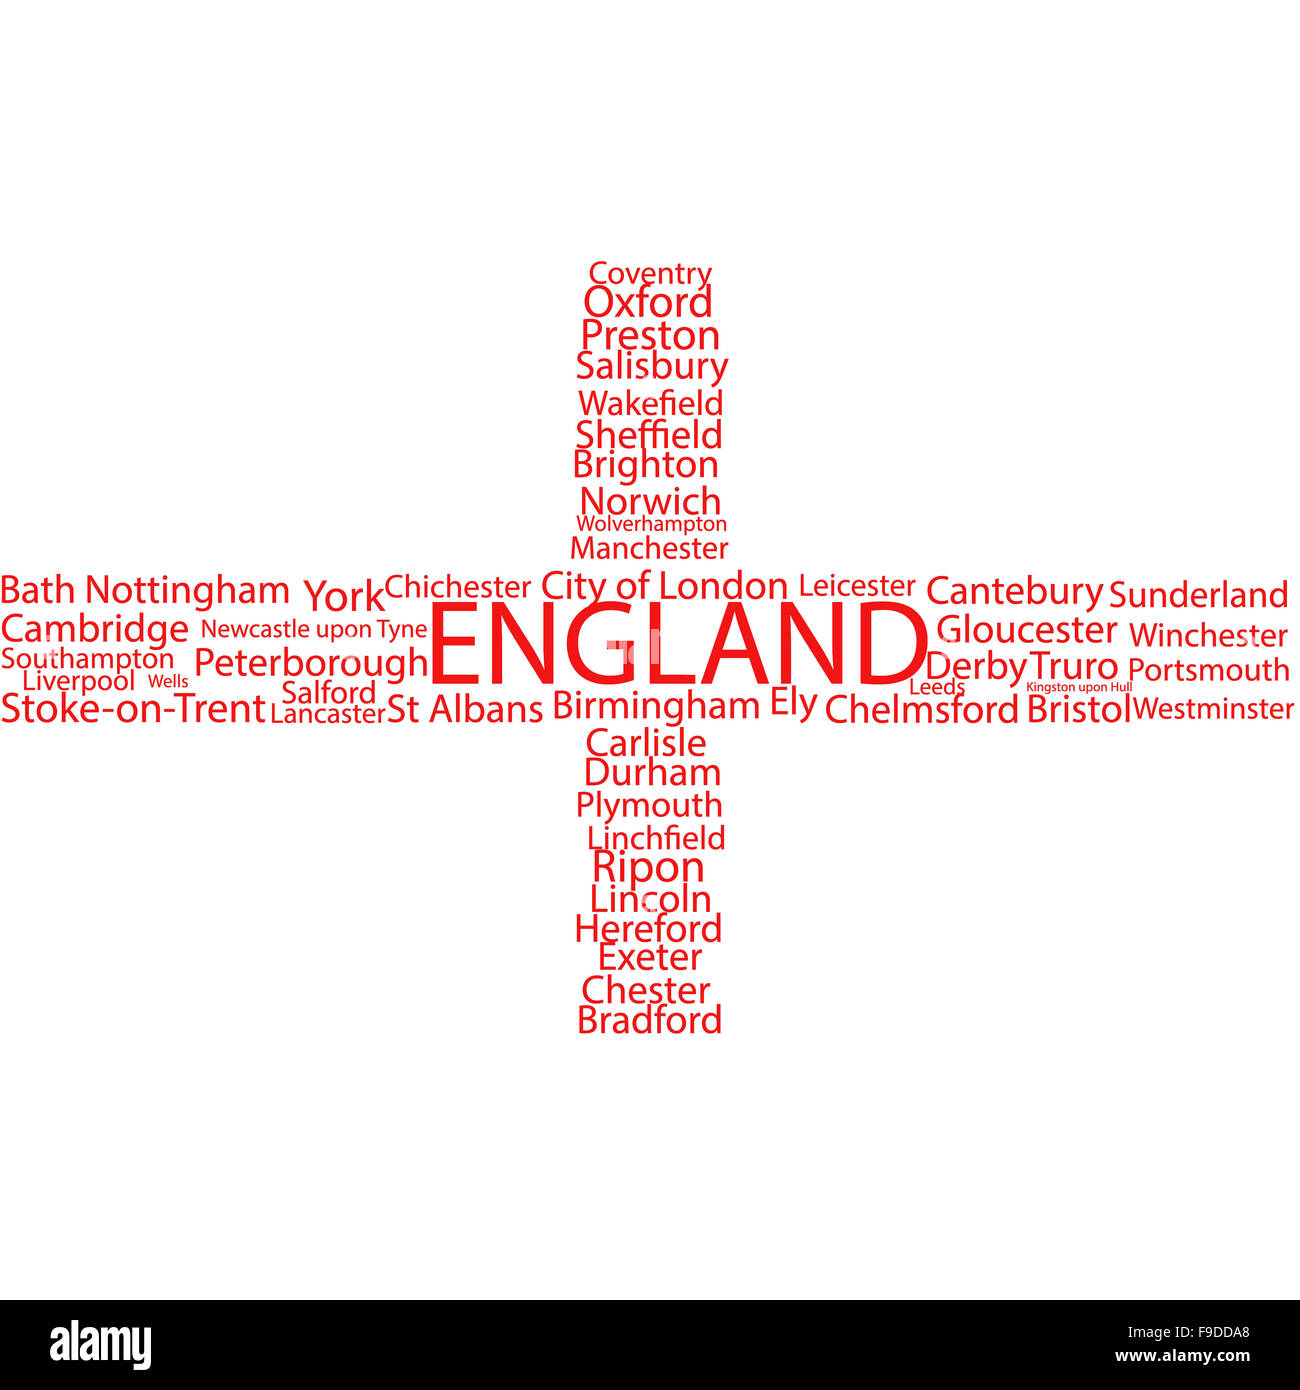 St Georges Cross Flag Imágenes De Stock & St Georges Cross Flag ...